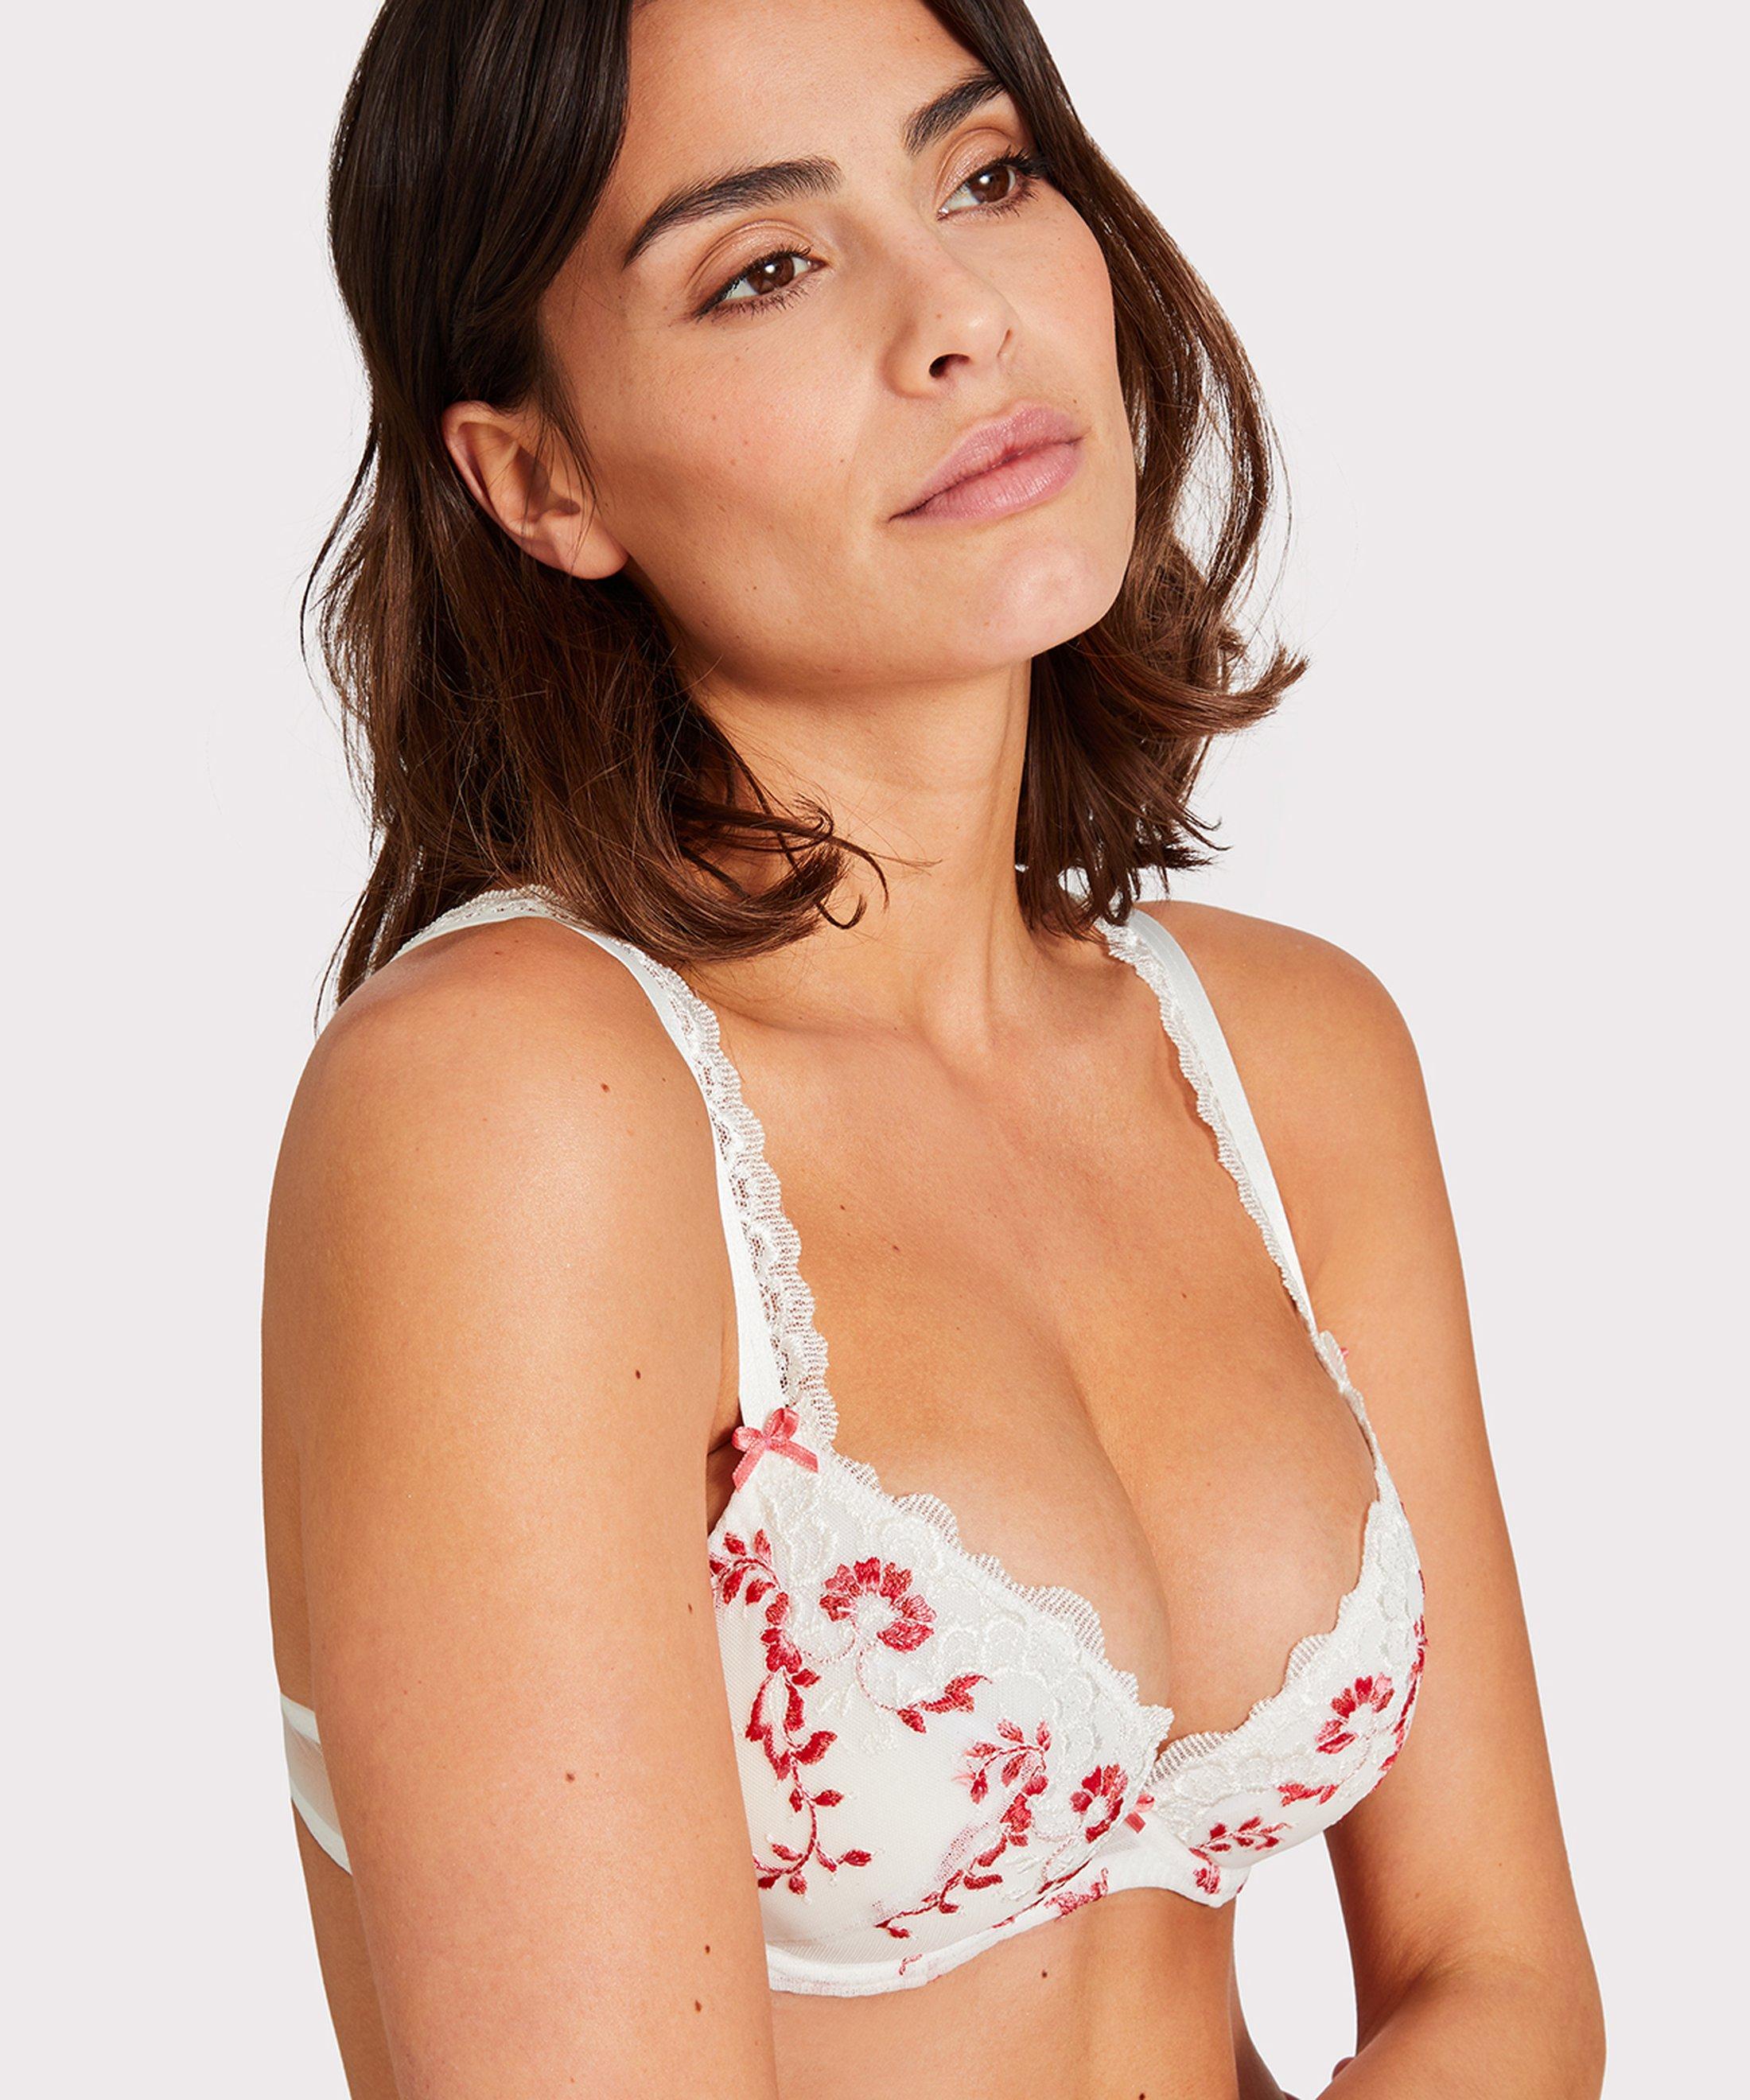 ROMANCE D'ÉTÉ Push-up bra White Begonia | Aubade